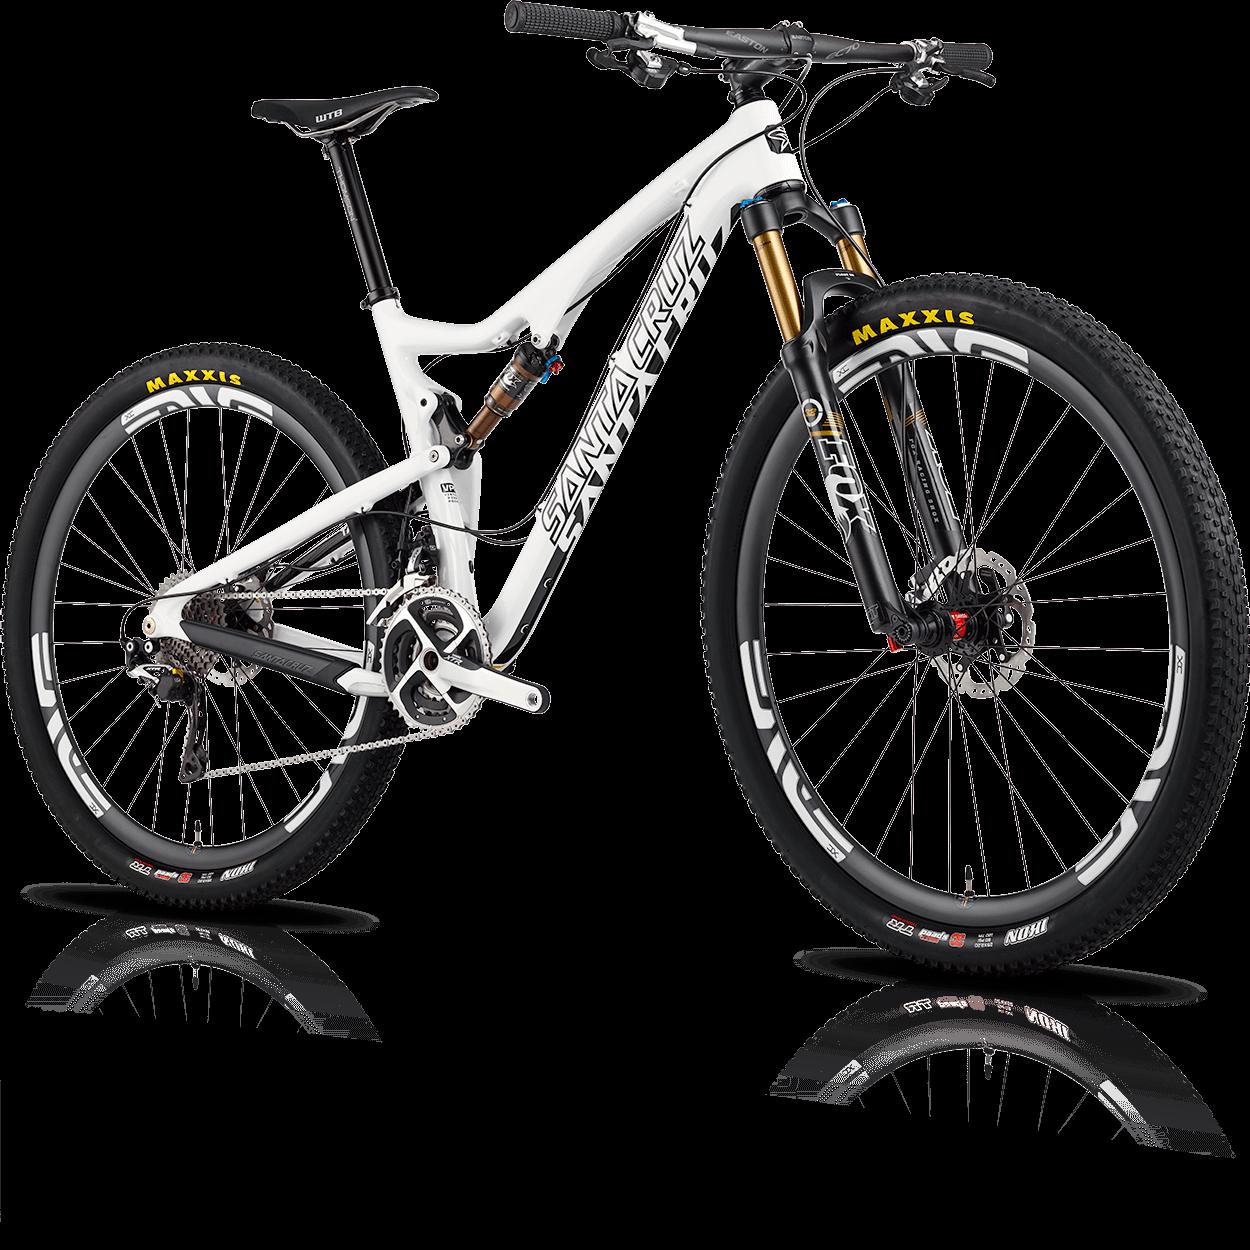 Dream Bike - Santa Cruz Bicycles Tallboy Carbon | Mountain bike ...